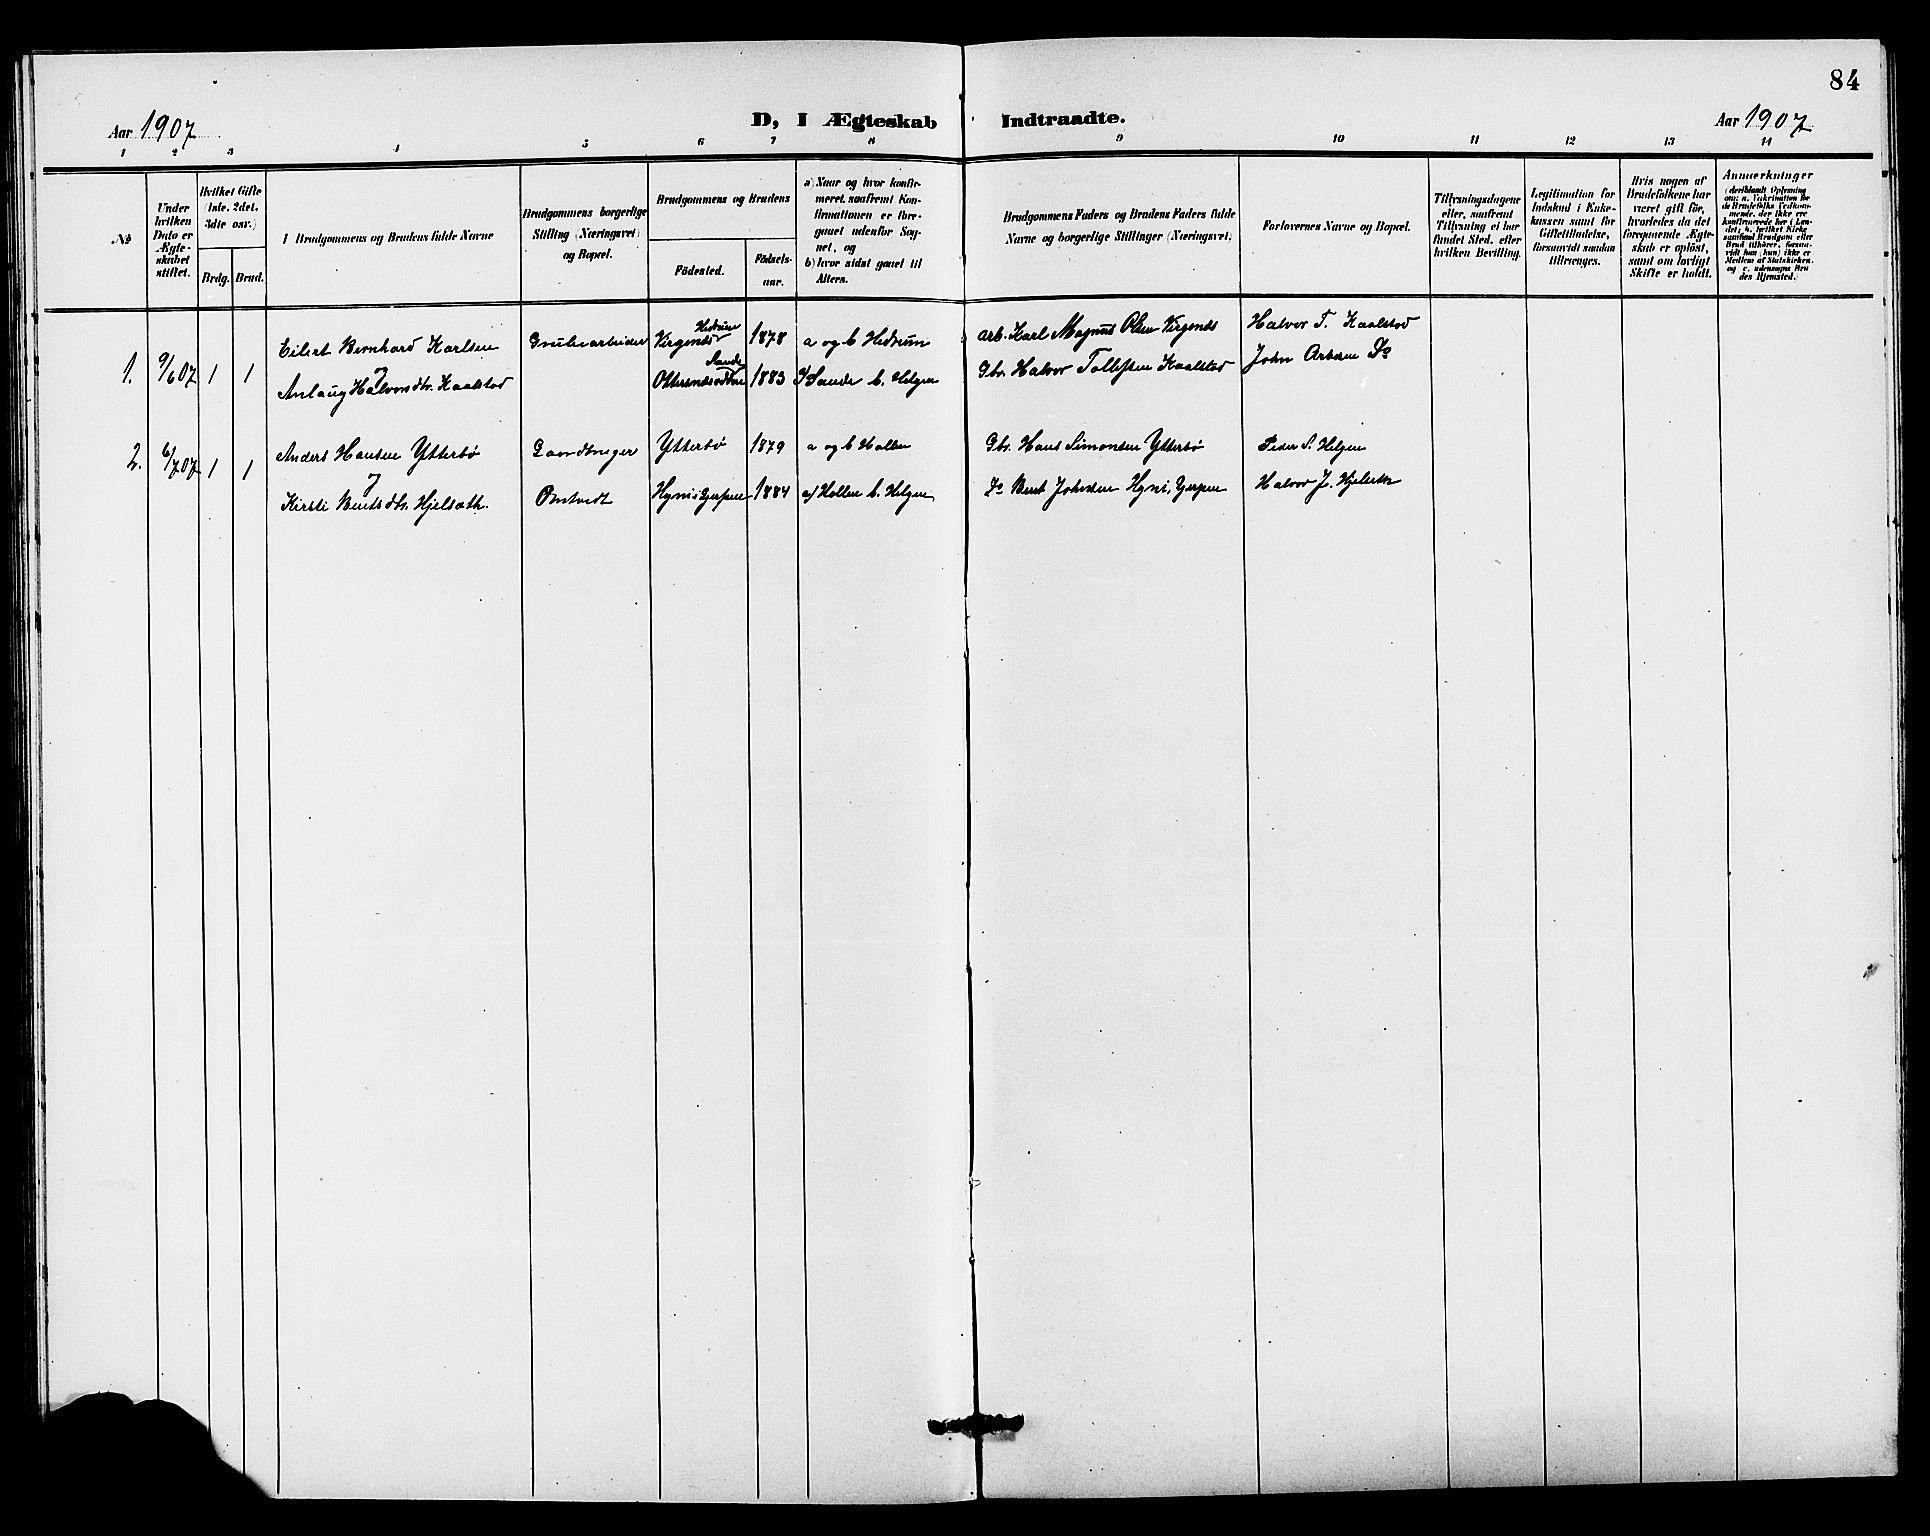 SAKO, Holla kirkebøker, G/Gb/L0002: Klokkerbok nr. II 2, 1897-1913, s. 84